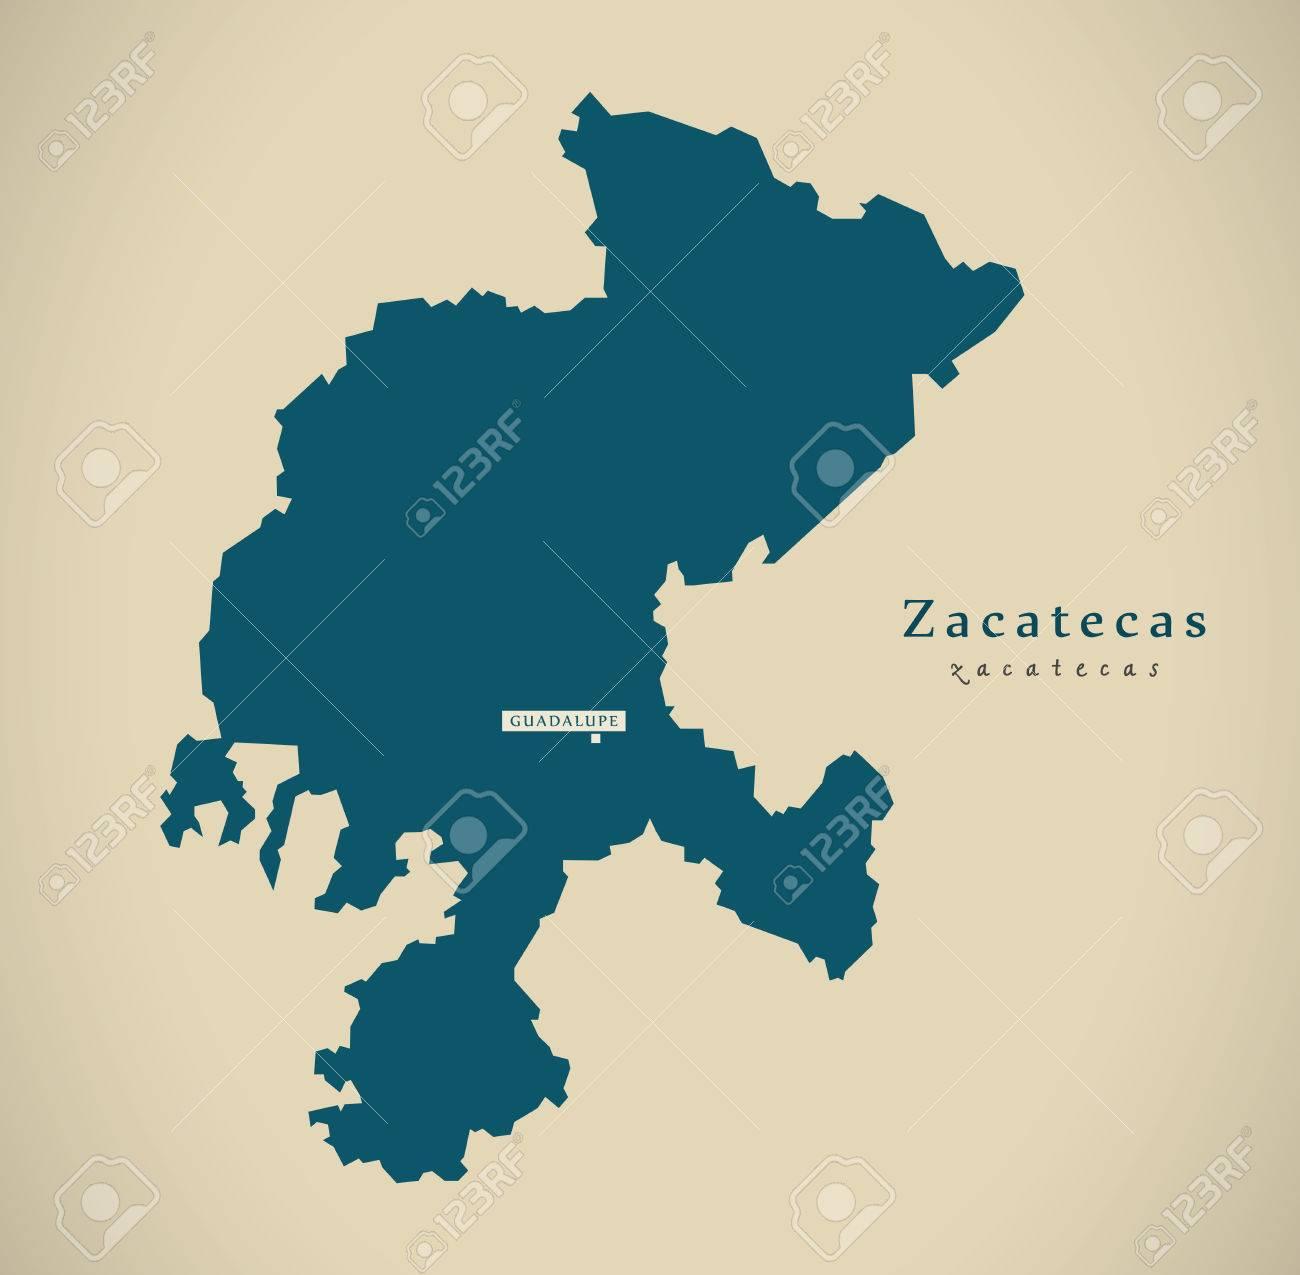 Stock Illustration on oaxaca mexico map, zacatecas satellite map, puerto escondido mexico map, tijuana mexico map, guerrero mexico map, chihuahua mexico map, michoacan mexico map, tamaulipas map, nochistlan zacatecas map, malinalco mexico map, acapulco mexico map, san luis potosí mexico map, zacatecas state map, cancun mexico map, morelia mexico map, guadalajara mexico map, jalpa zacatecas map, puebla mexico map, mazatlan mexico map, jalisco mexico map,